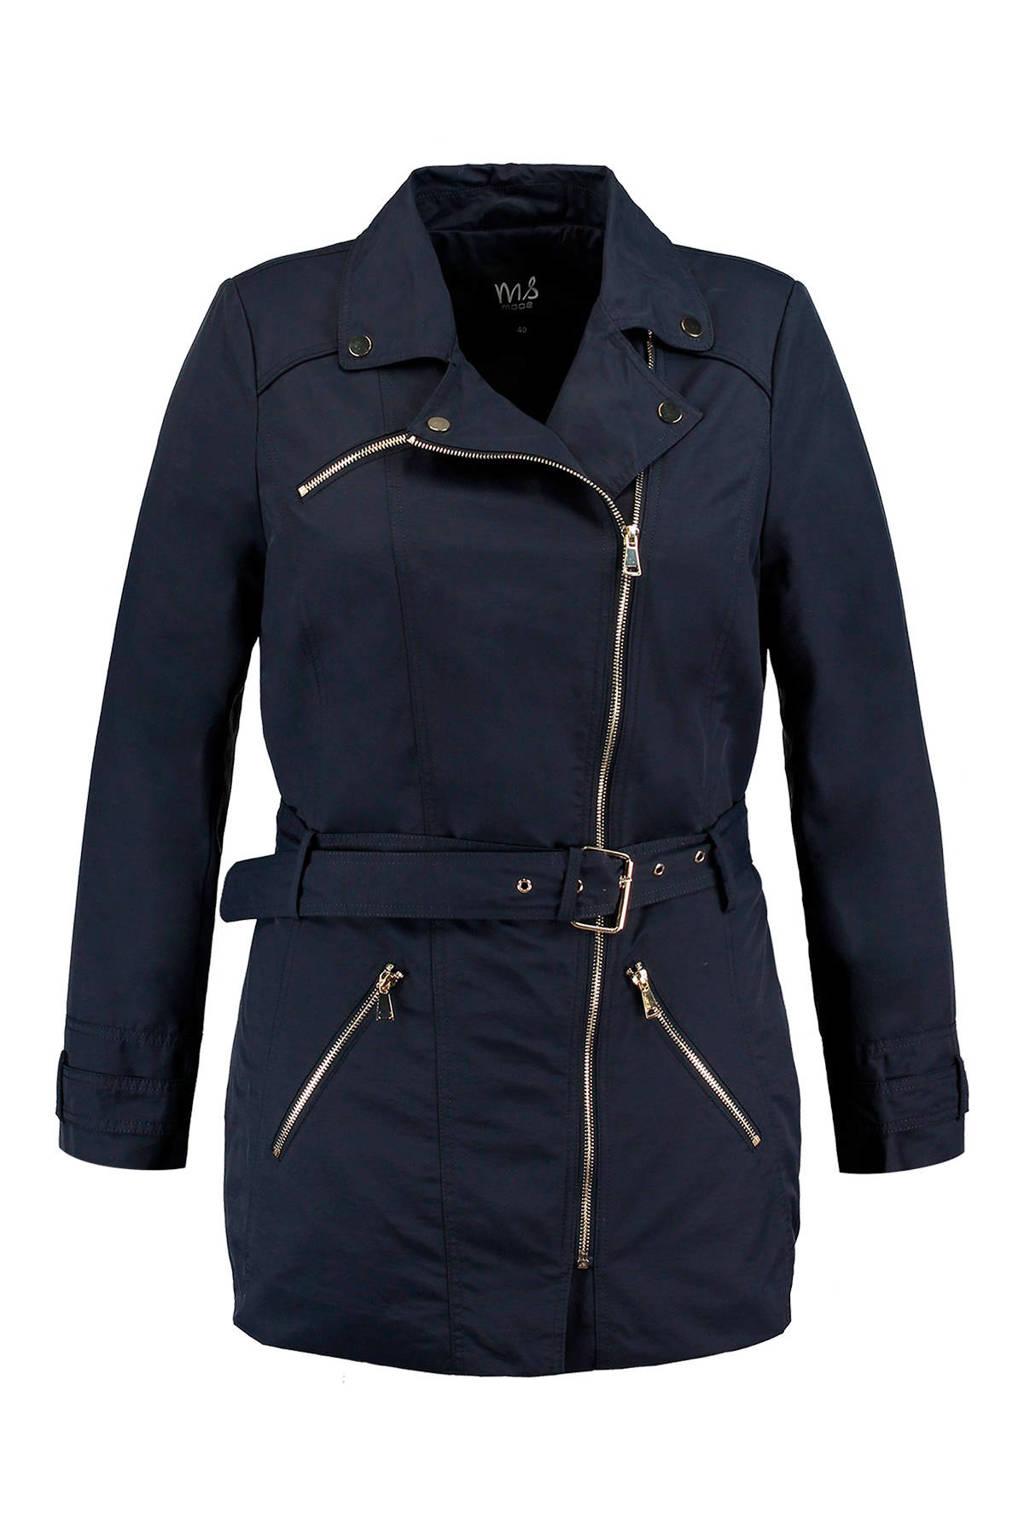 MS Mode trenchcoat donkerblauw, Donkerblauw